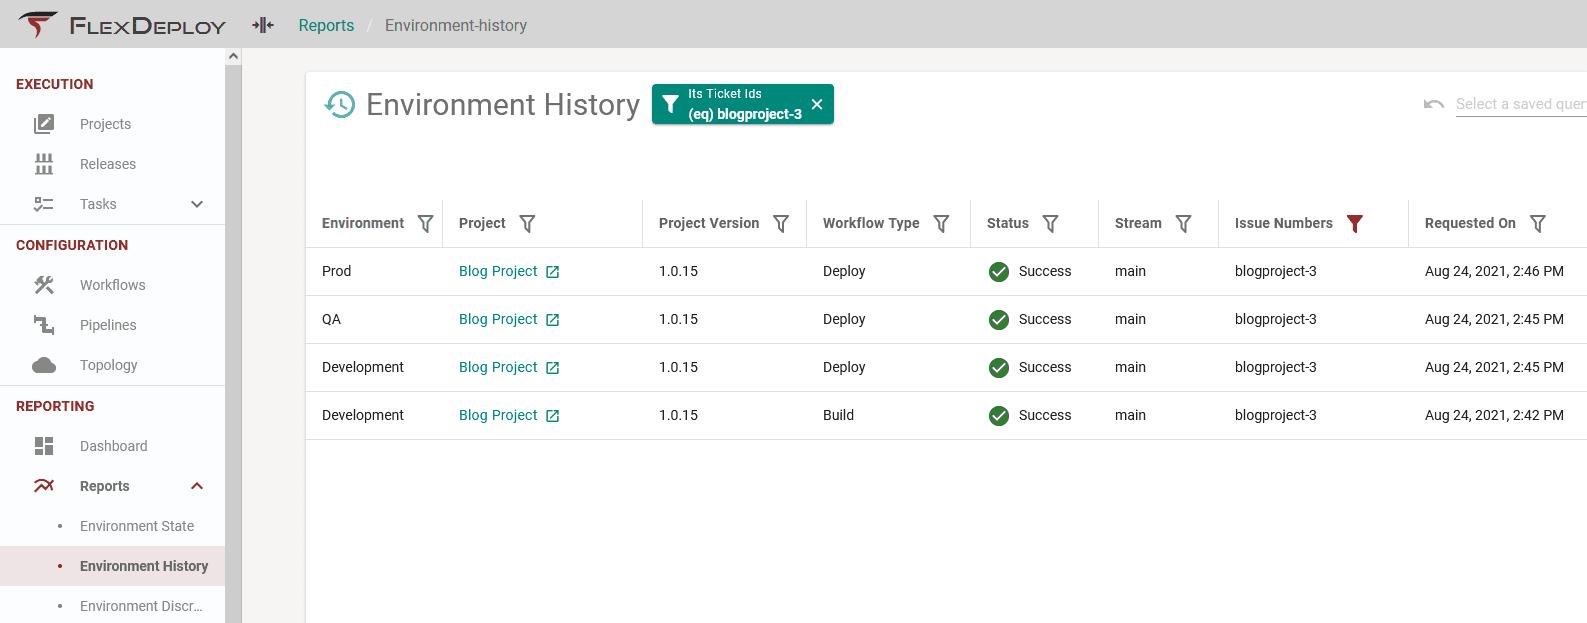 Environment History Report